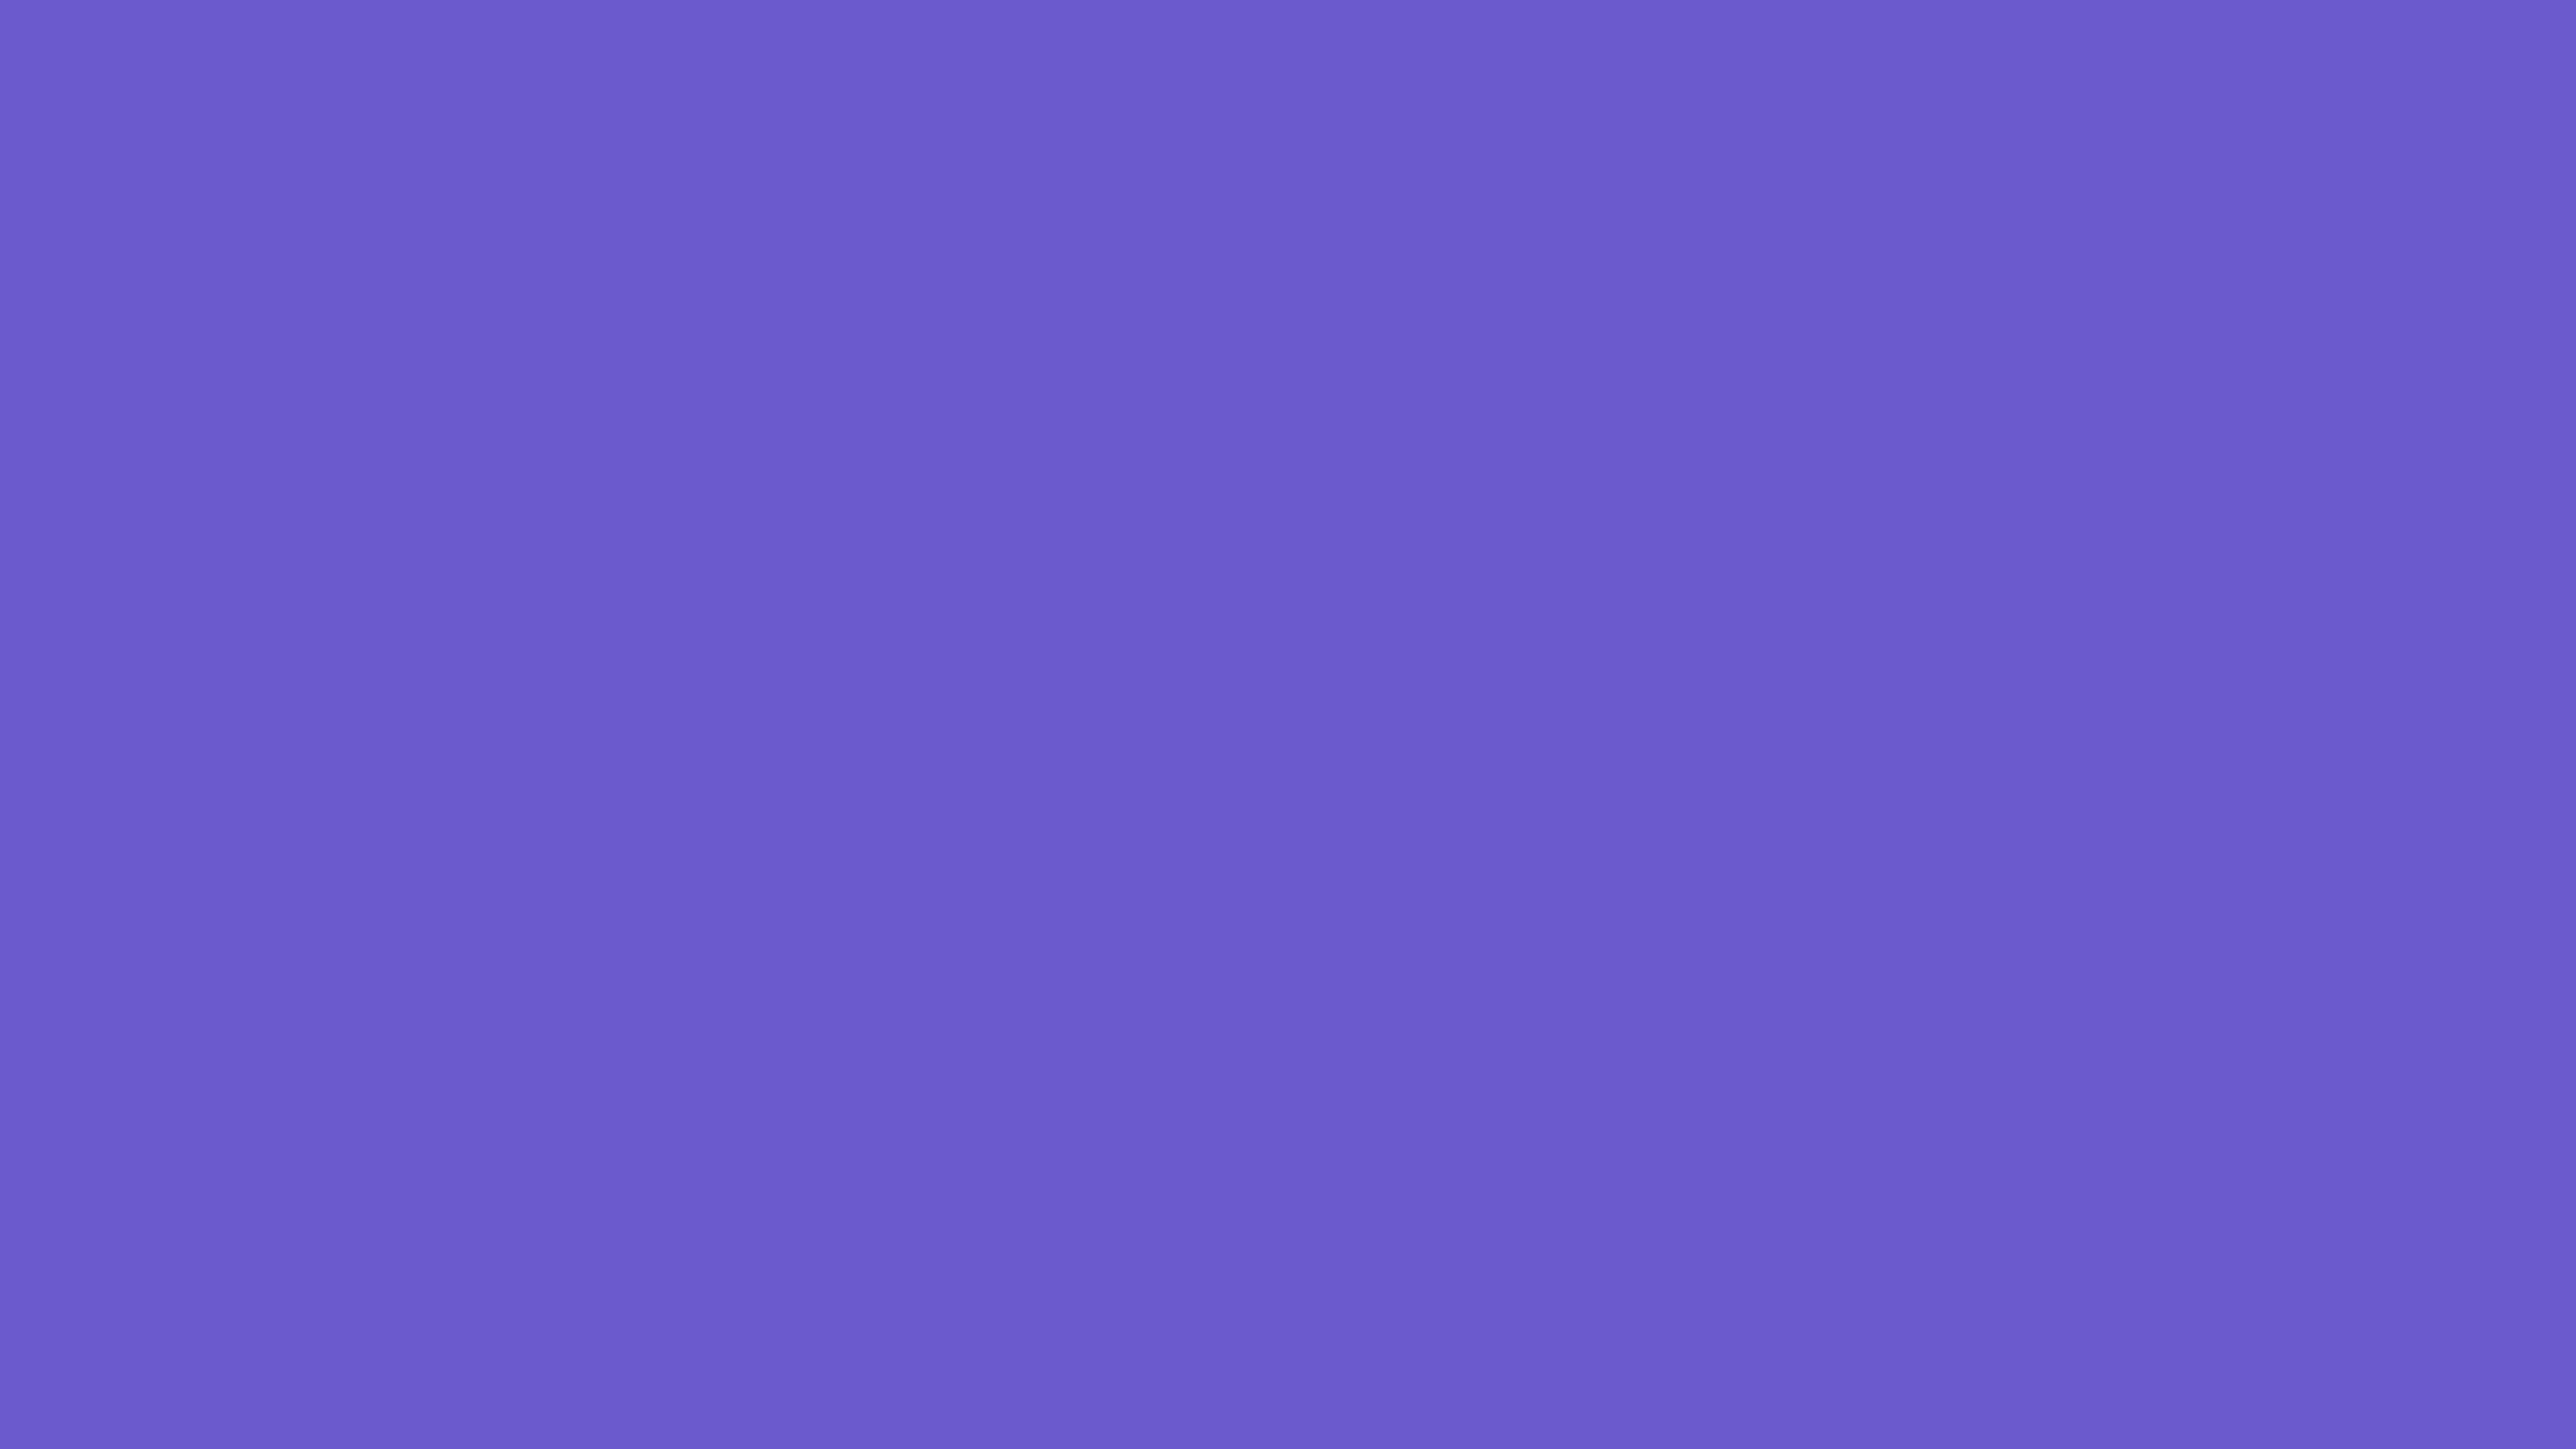 3840x2160 Slate Blue Solid Color Background